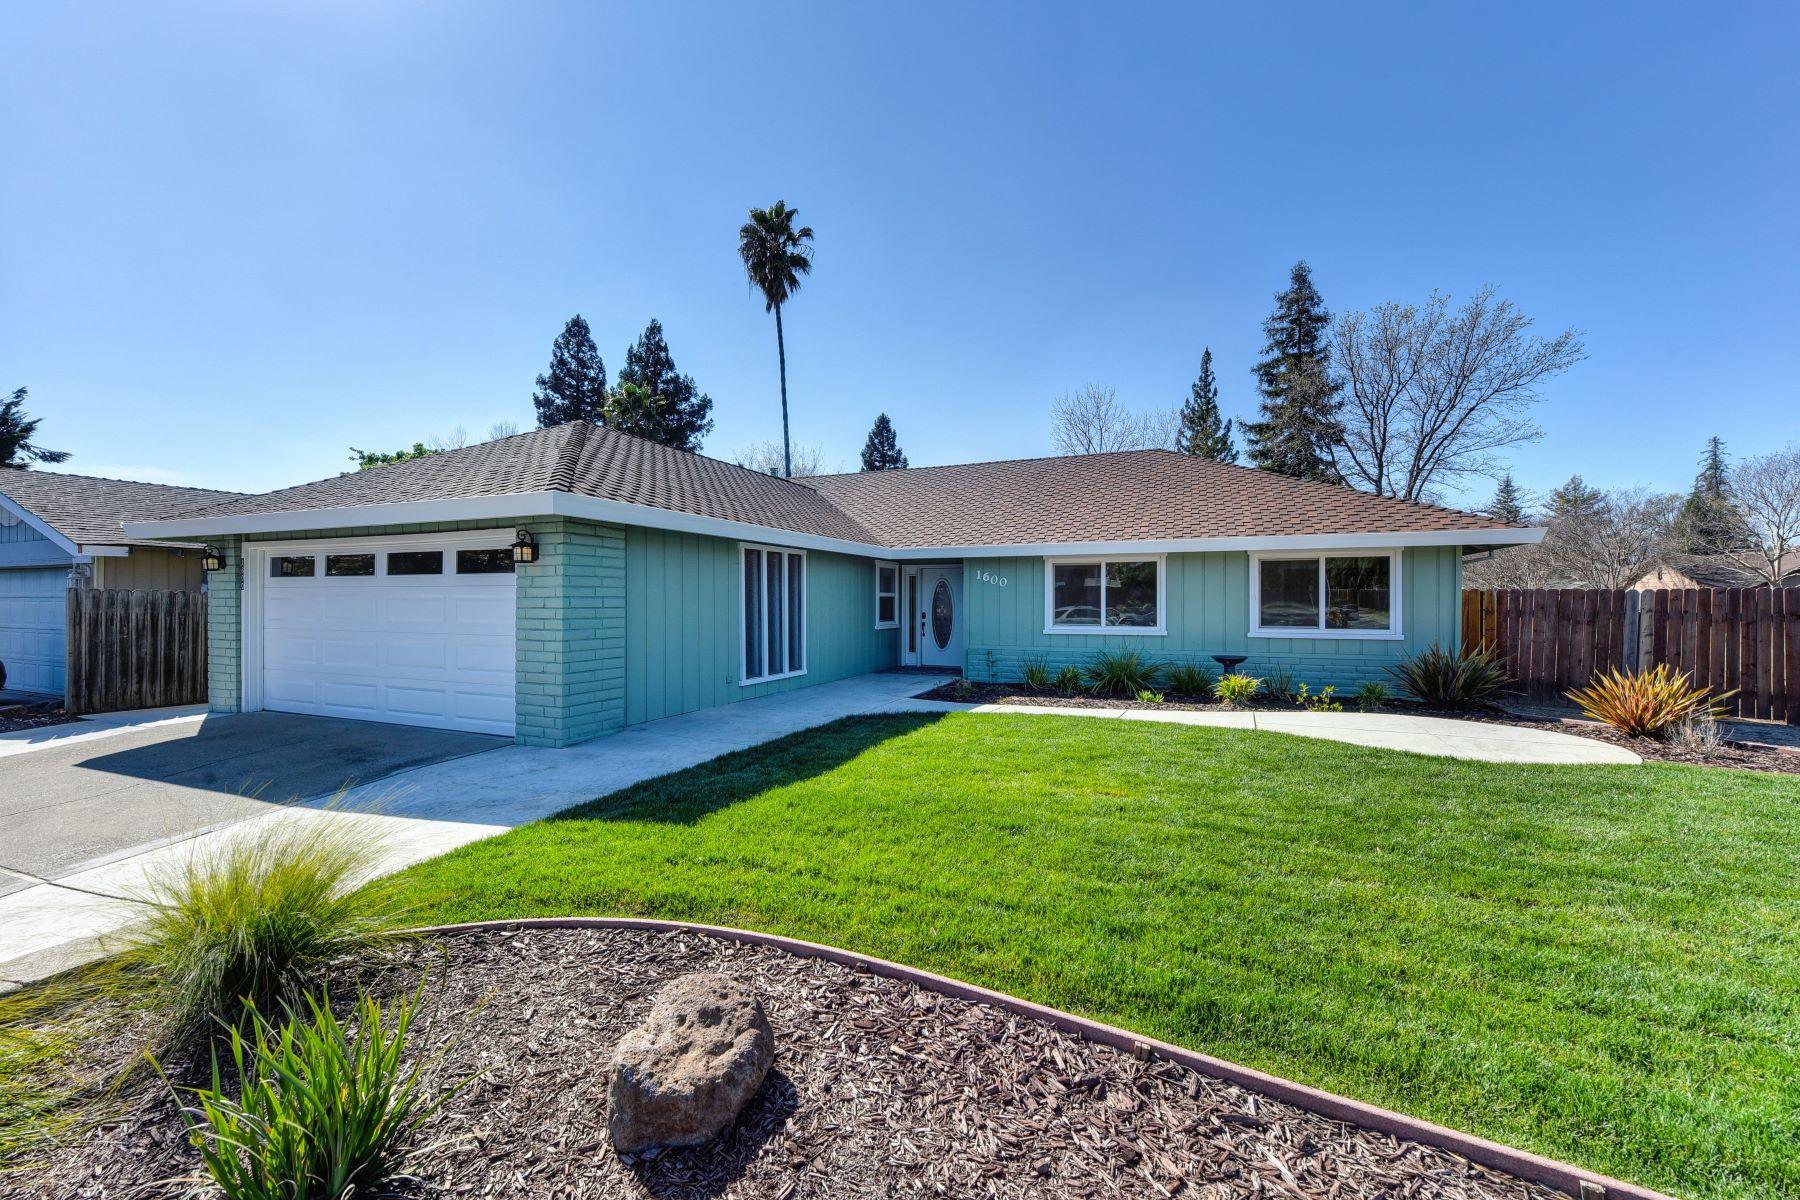 Single Family Homes para Venda às 1600 Crestmont Avenue, Roseville, CA 95661 Roseville, Califórnia 95661 Estados Unidos